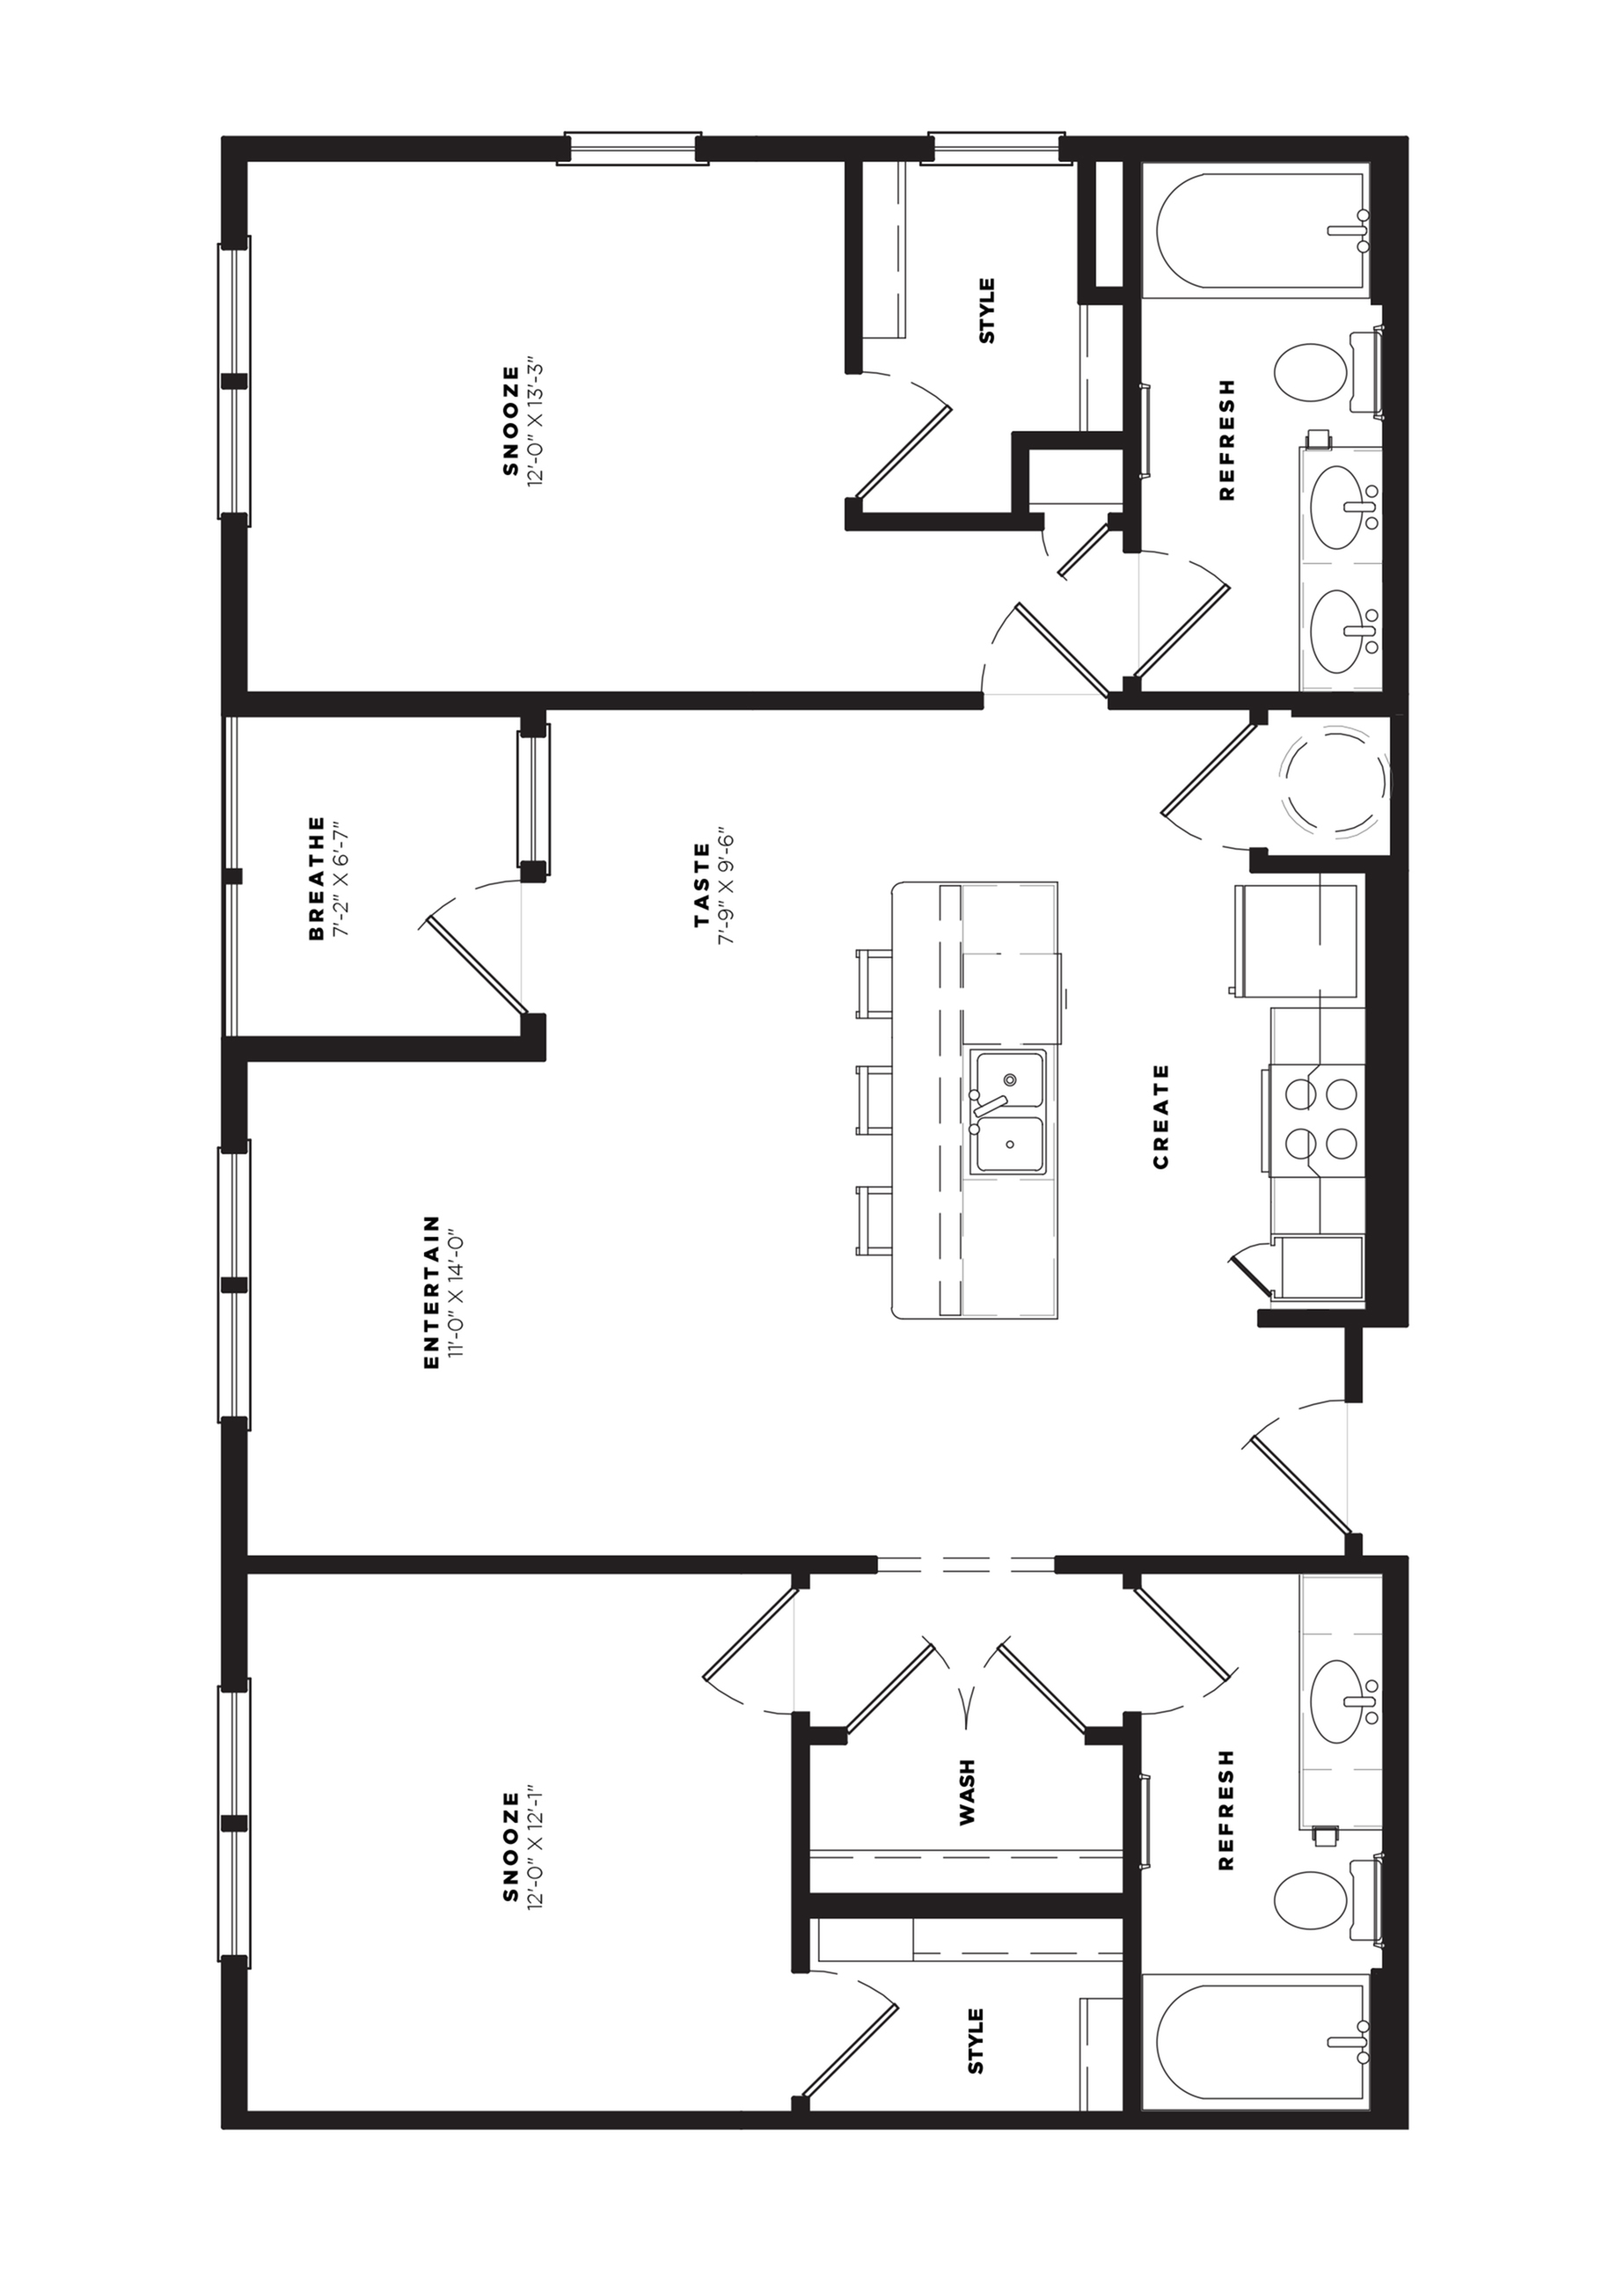 B2 Alt 1 Floor Plan